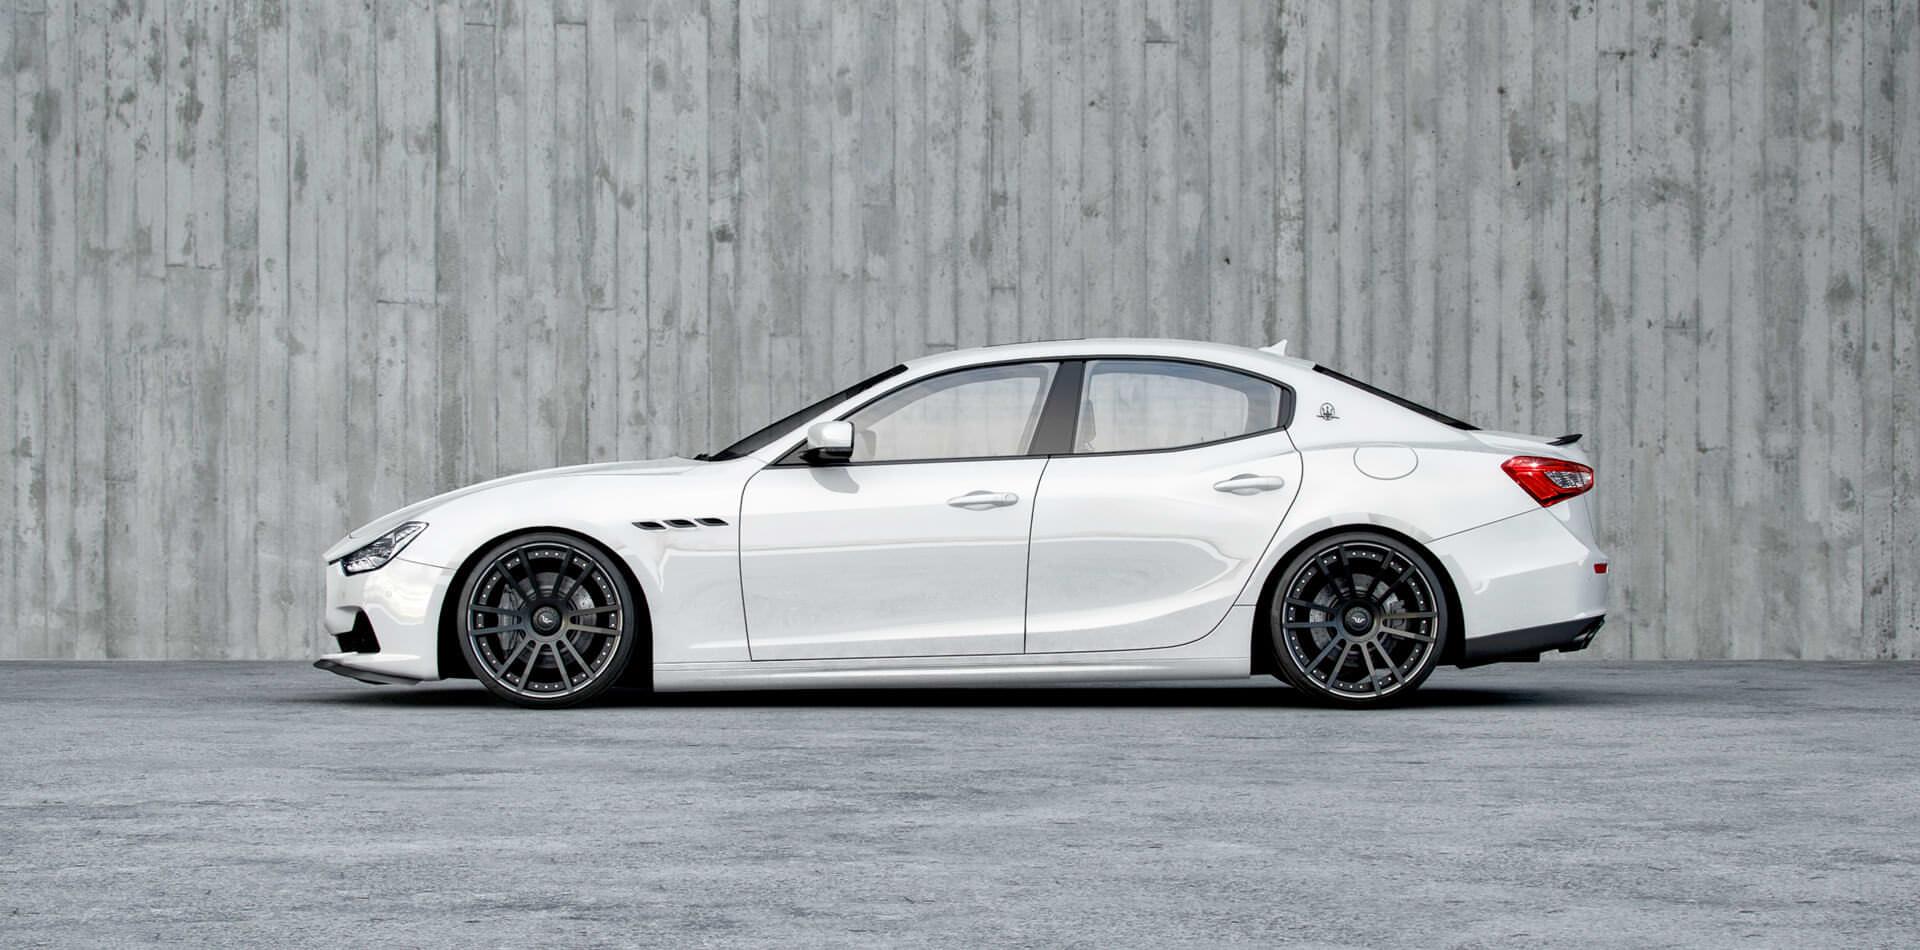 Maserati_Ghibli_SQ4_Felgen_21_Zoll-1